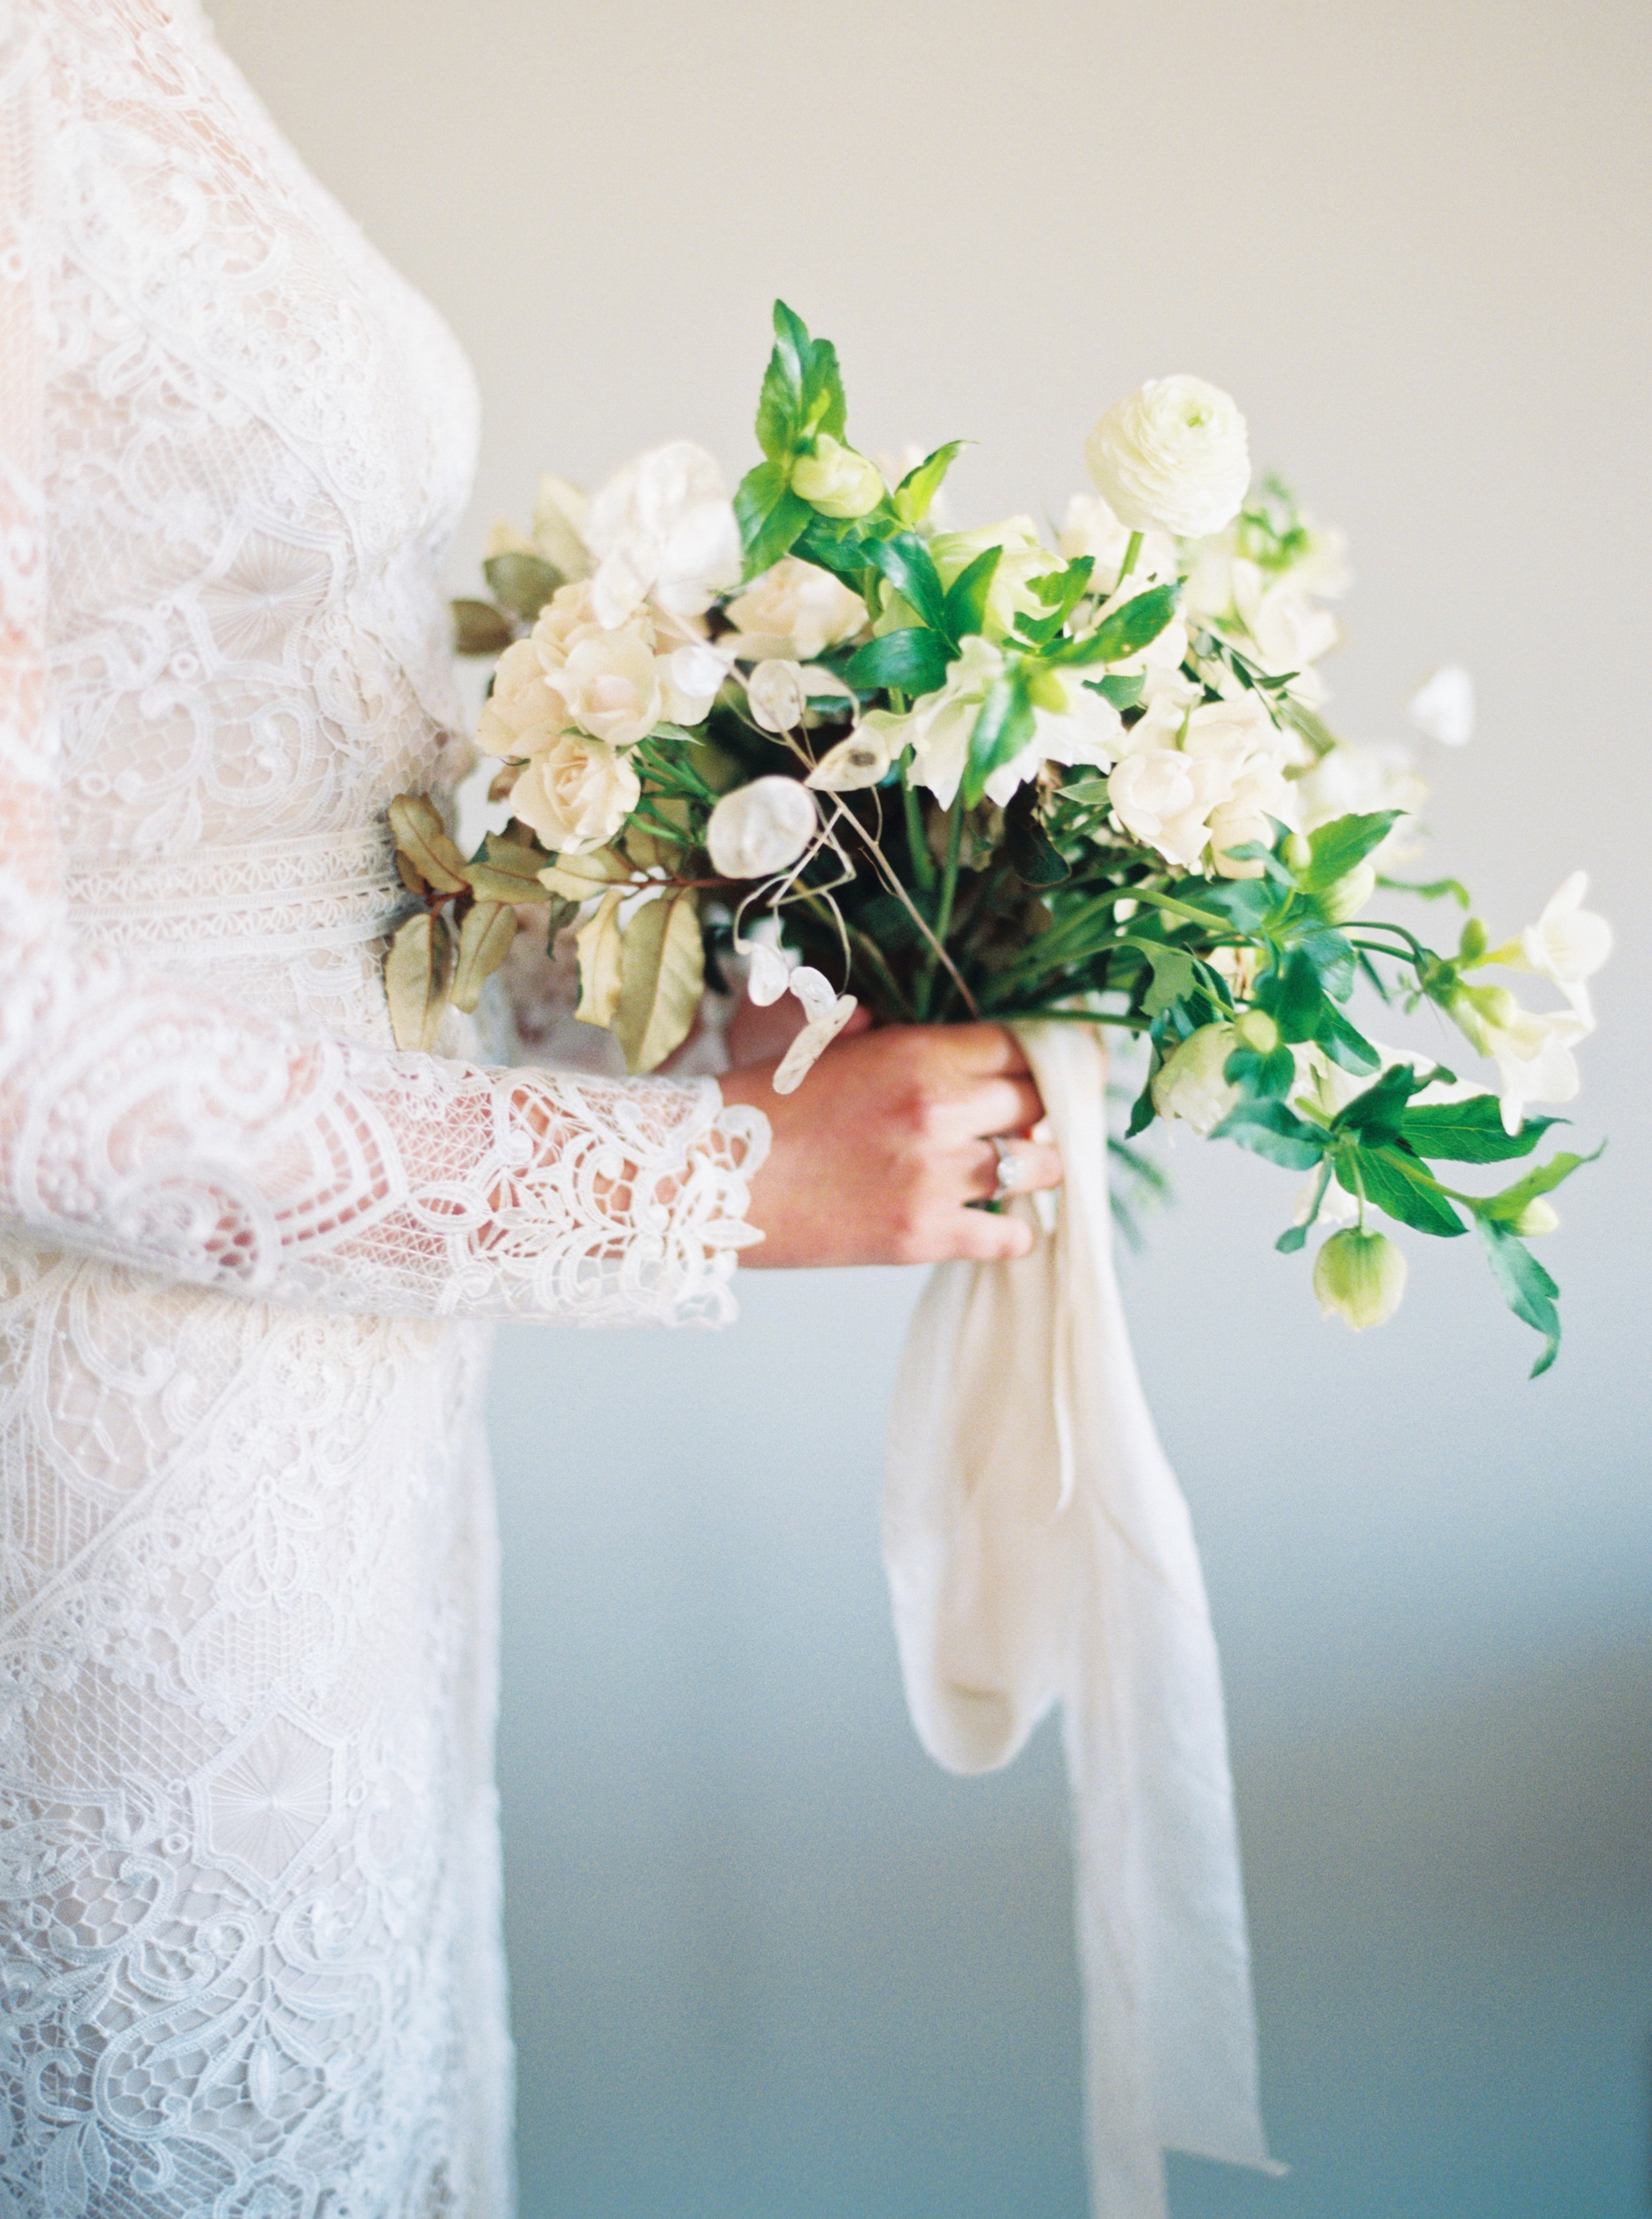 The-Foundry-Weddings-Dec-2016-043.jpg